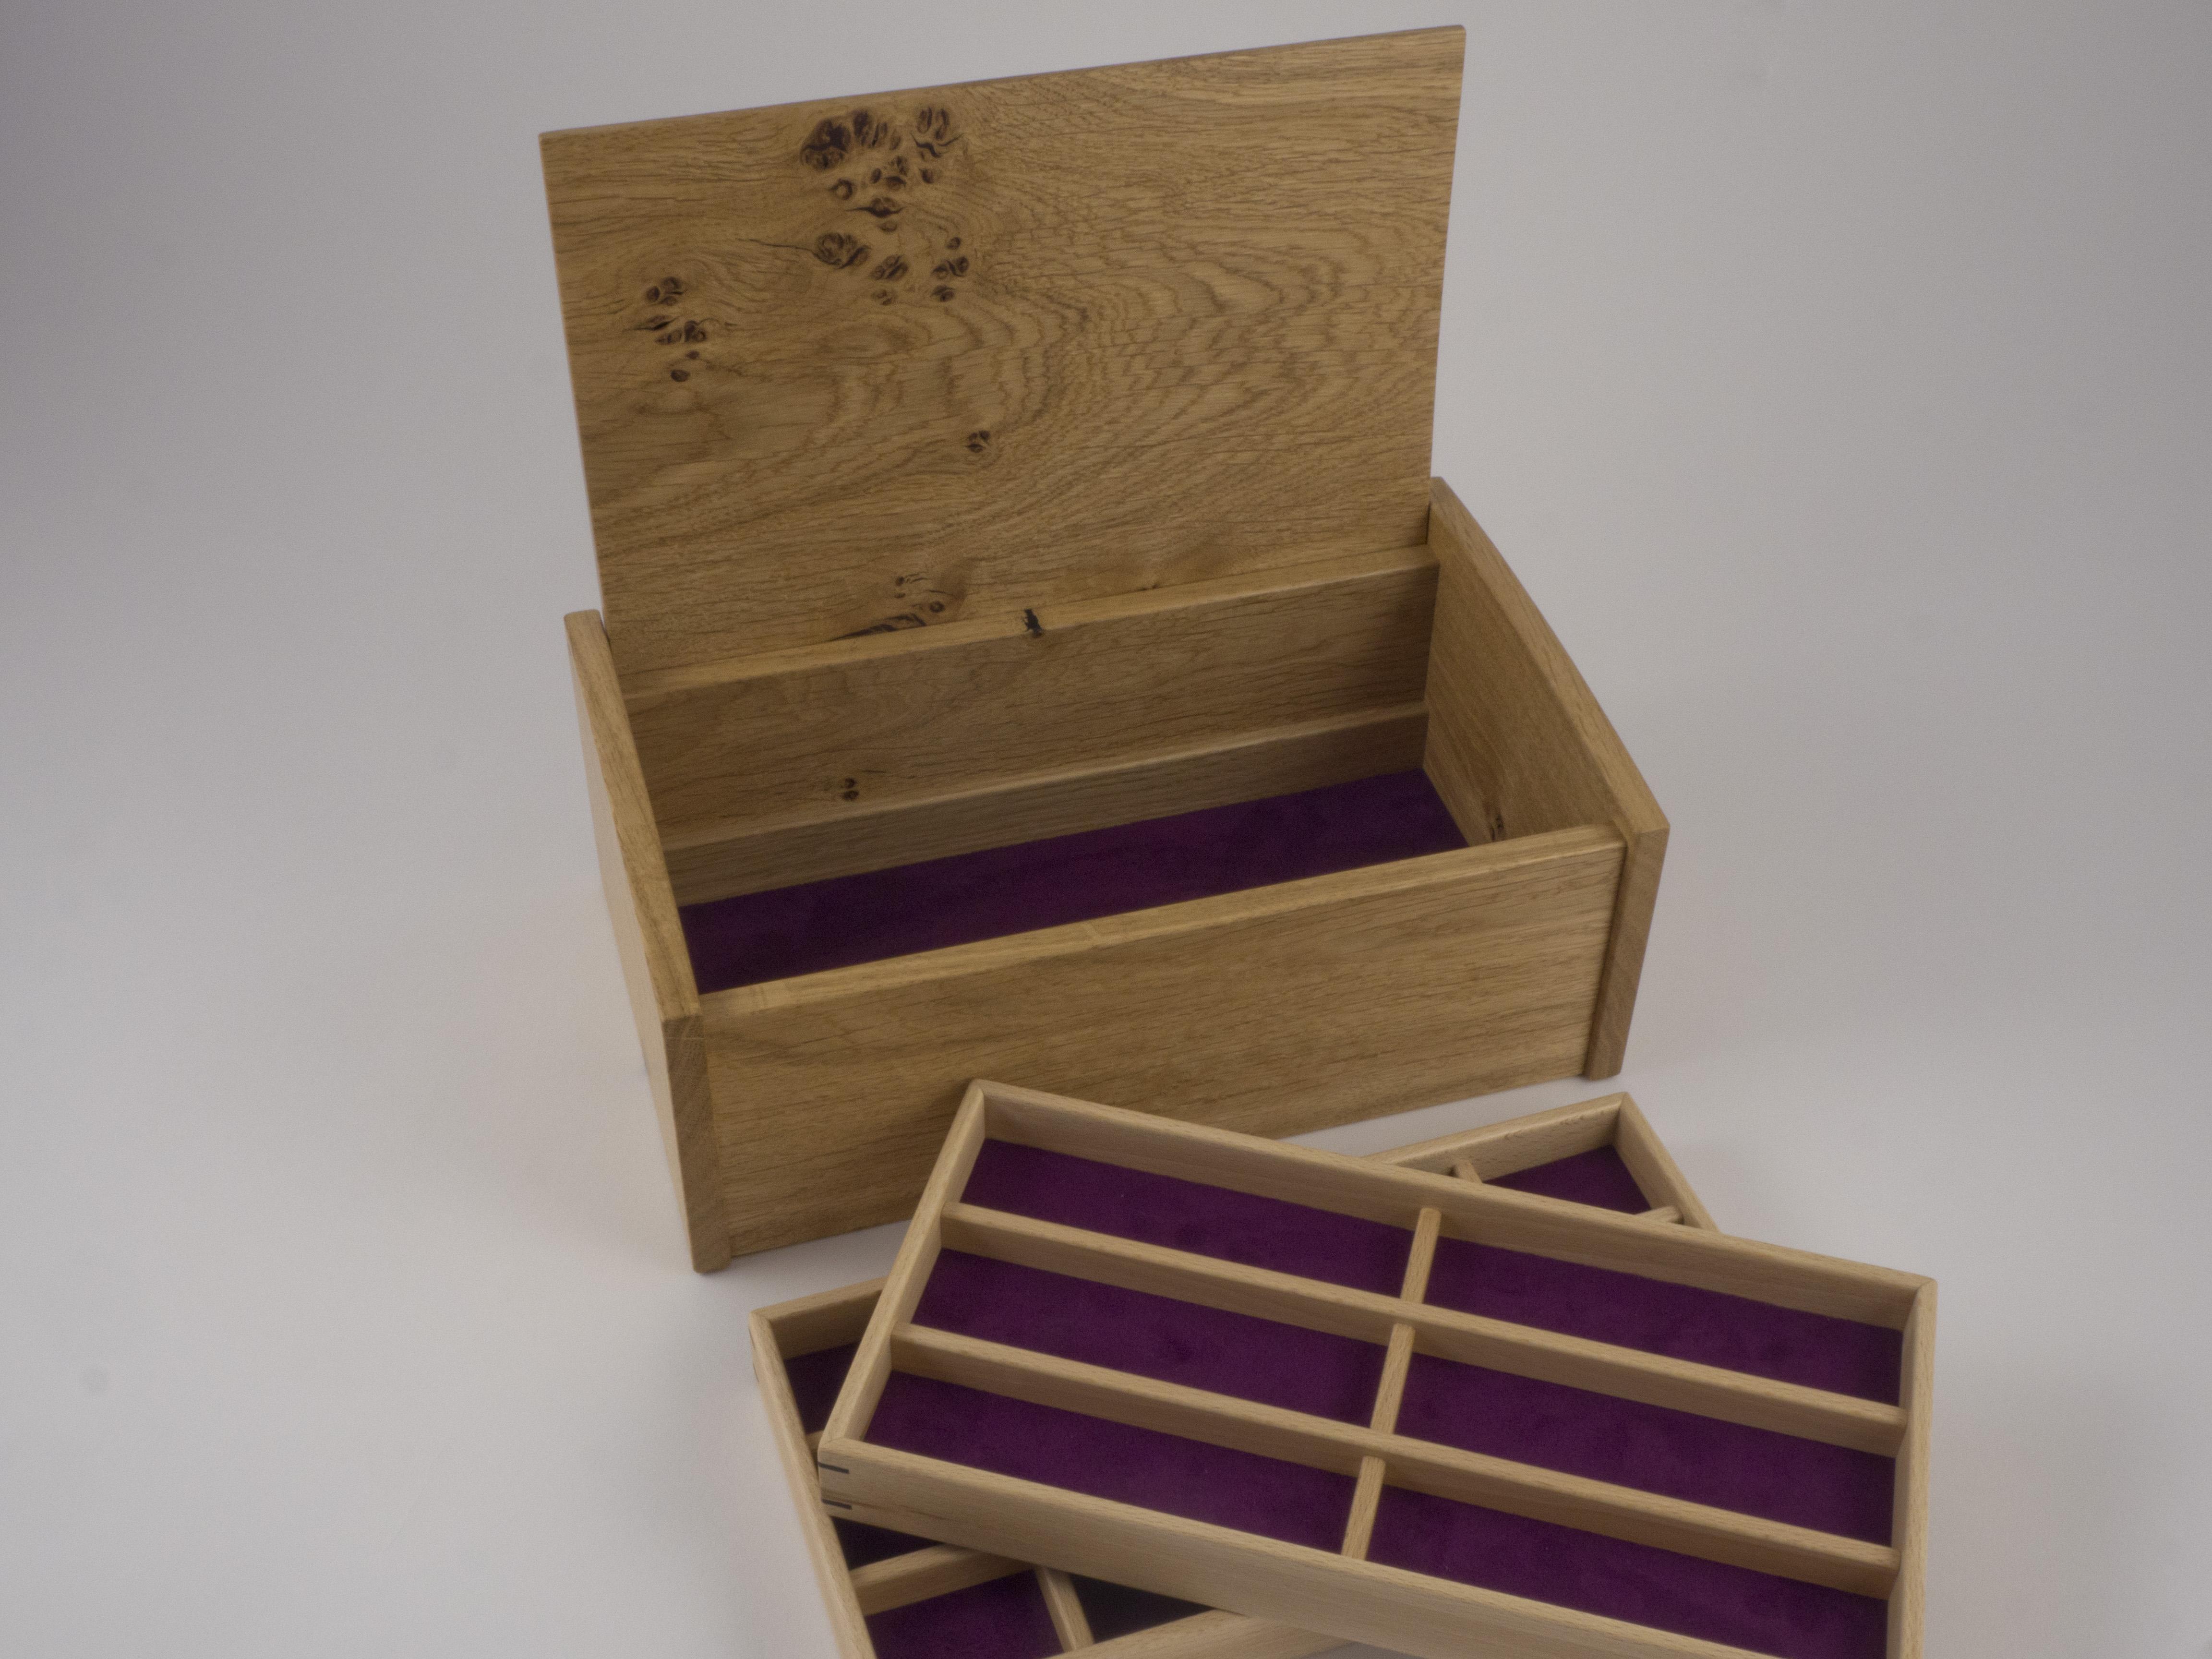 Bottom storage area in jewellery box